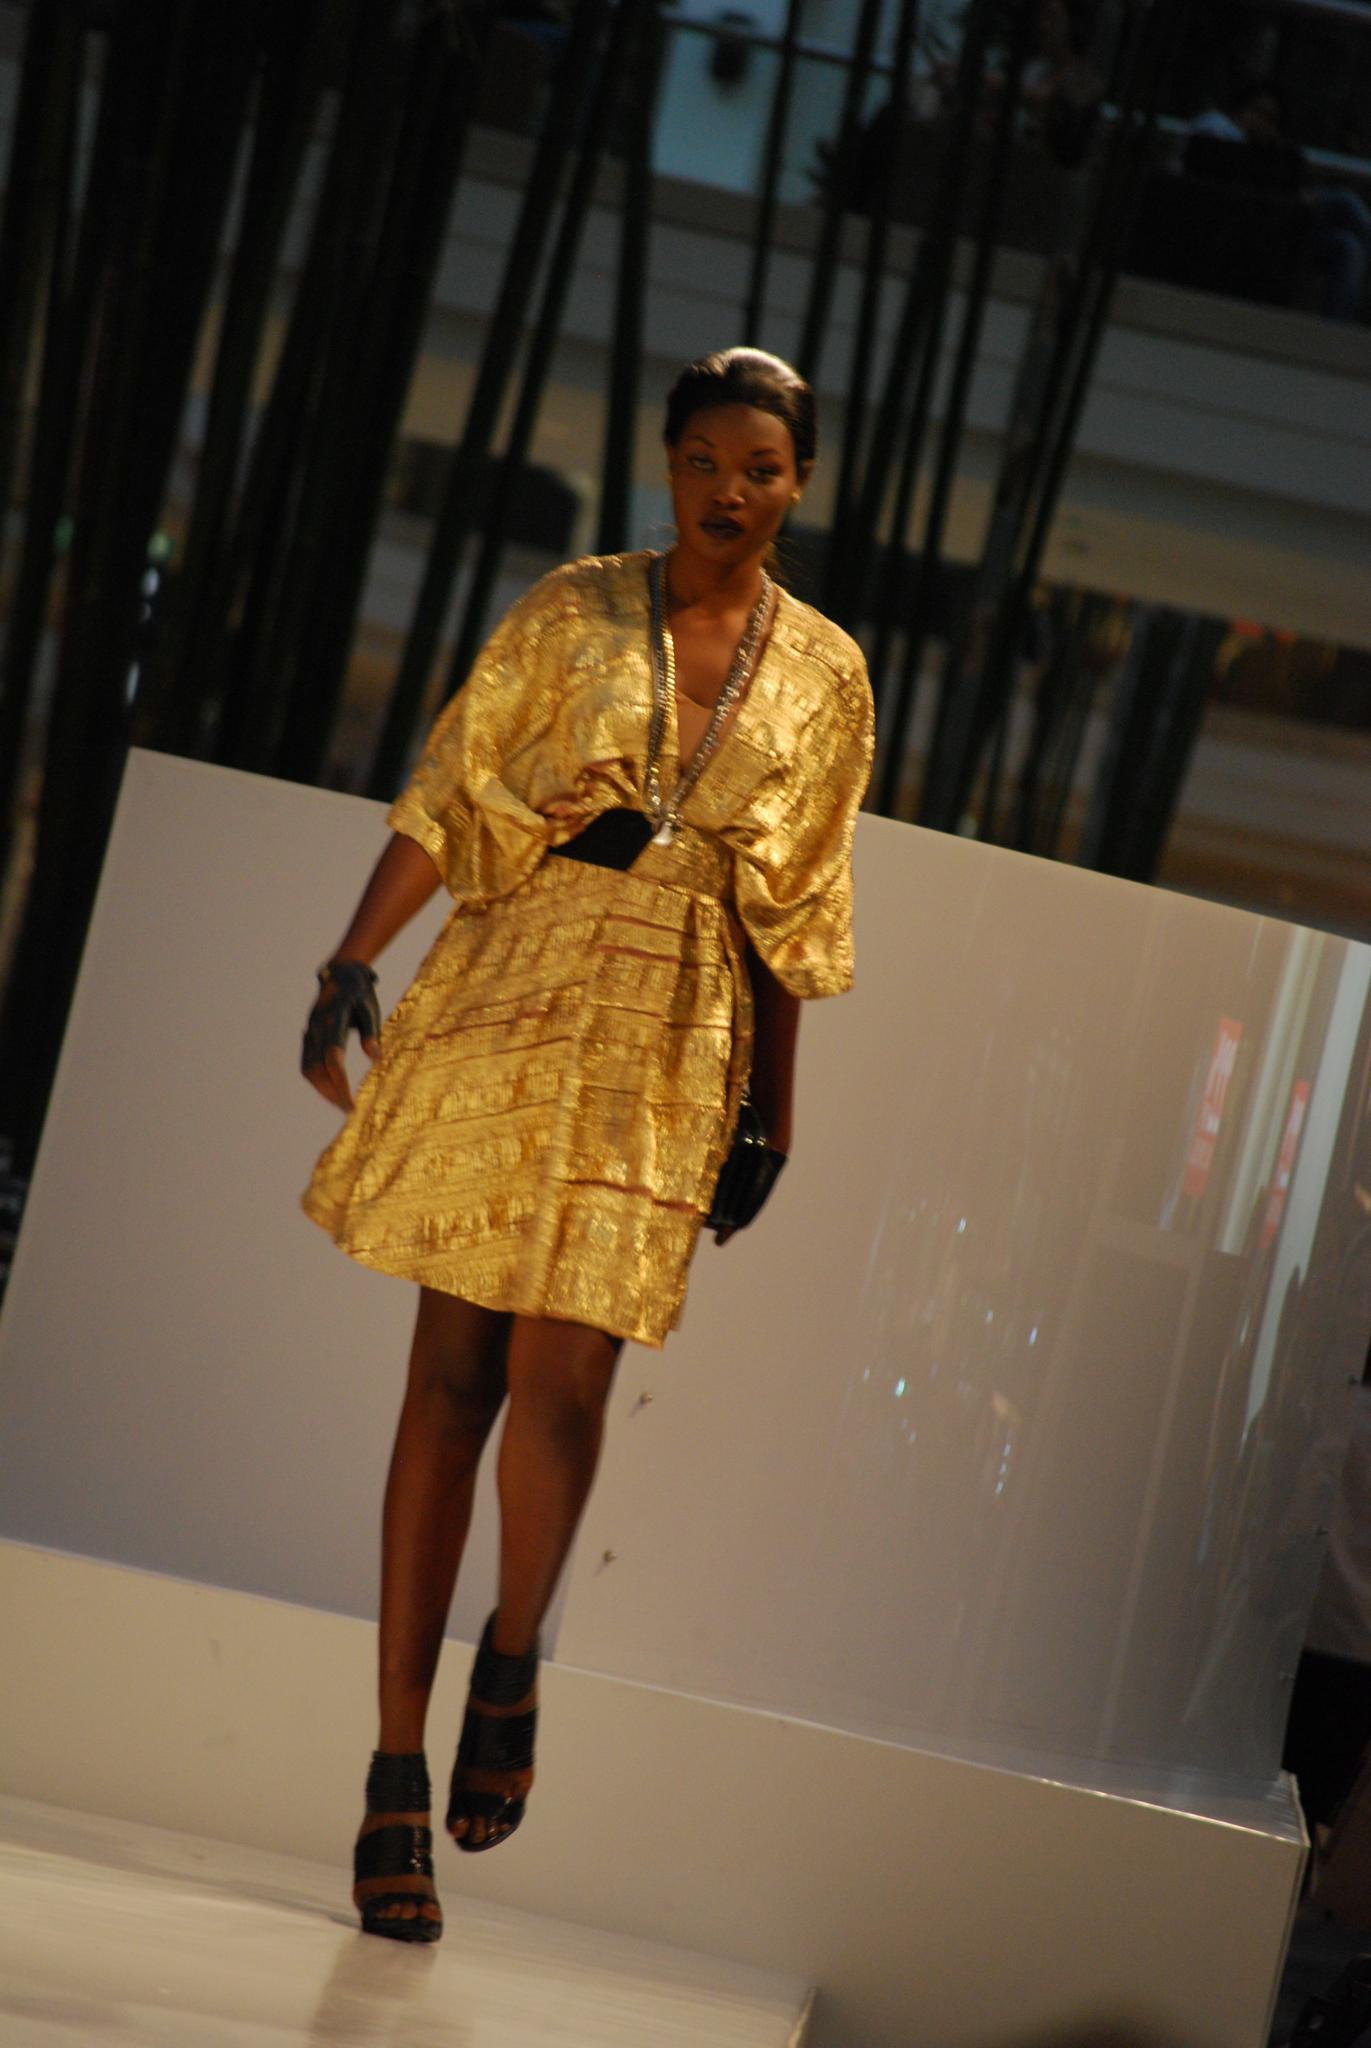 Fashion Square Directions